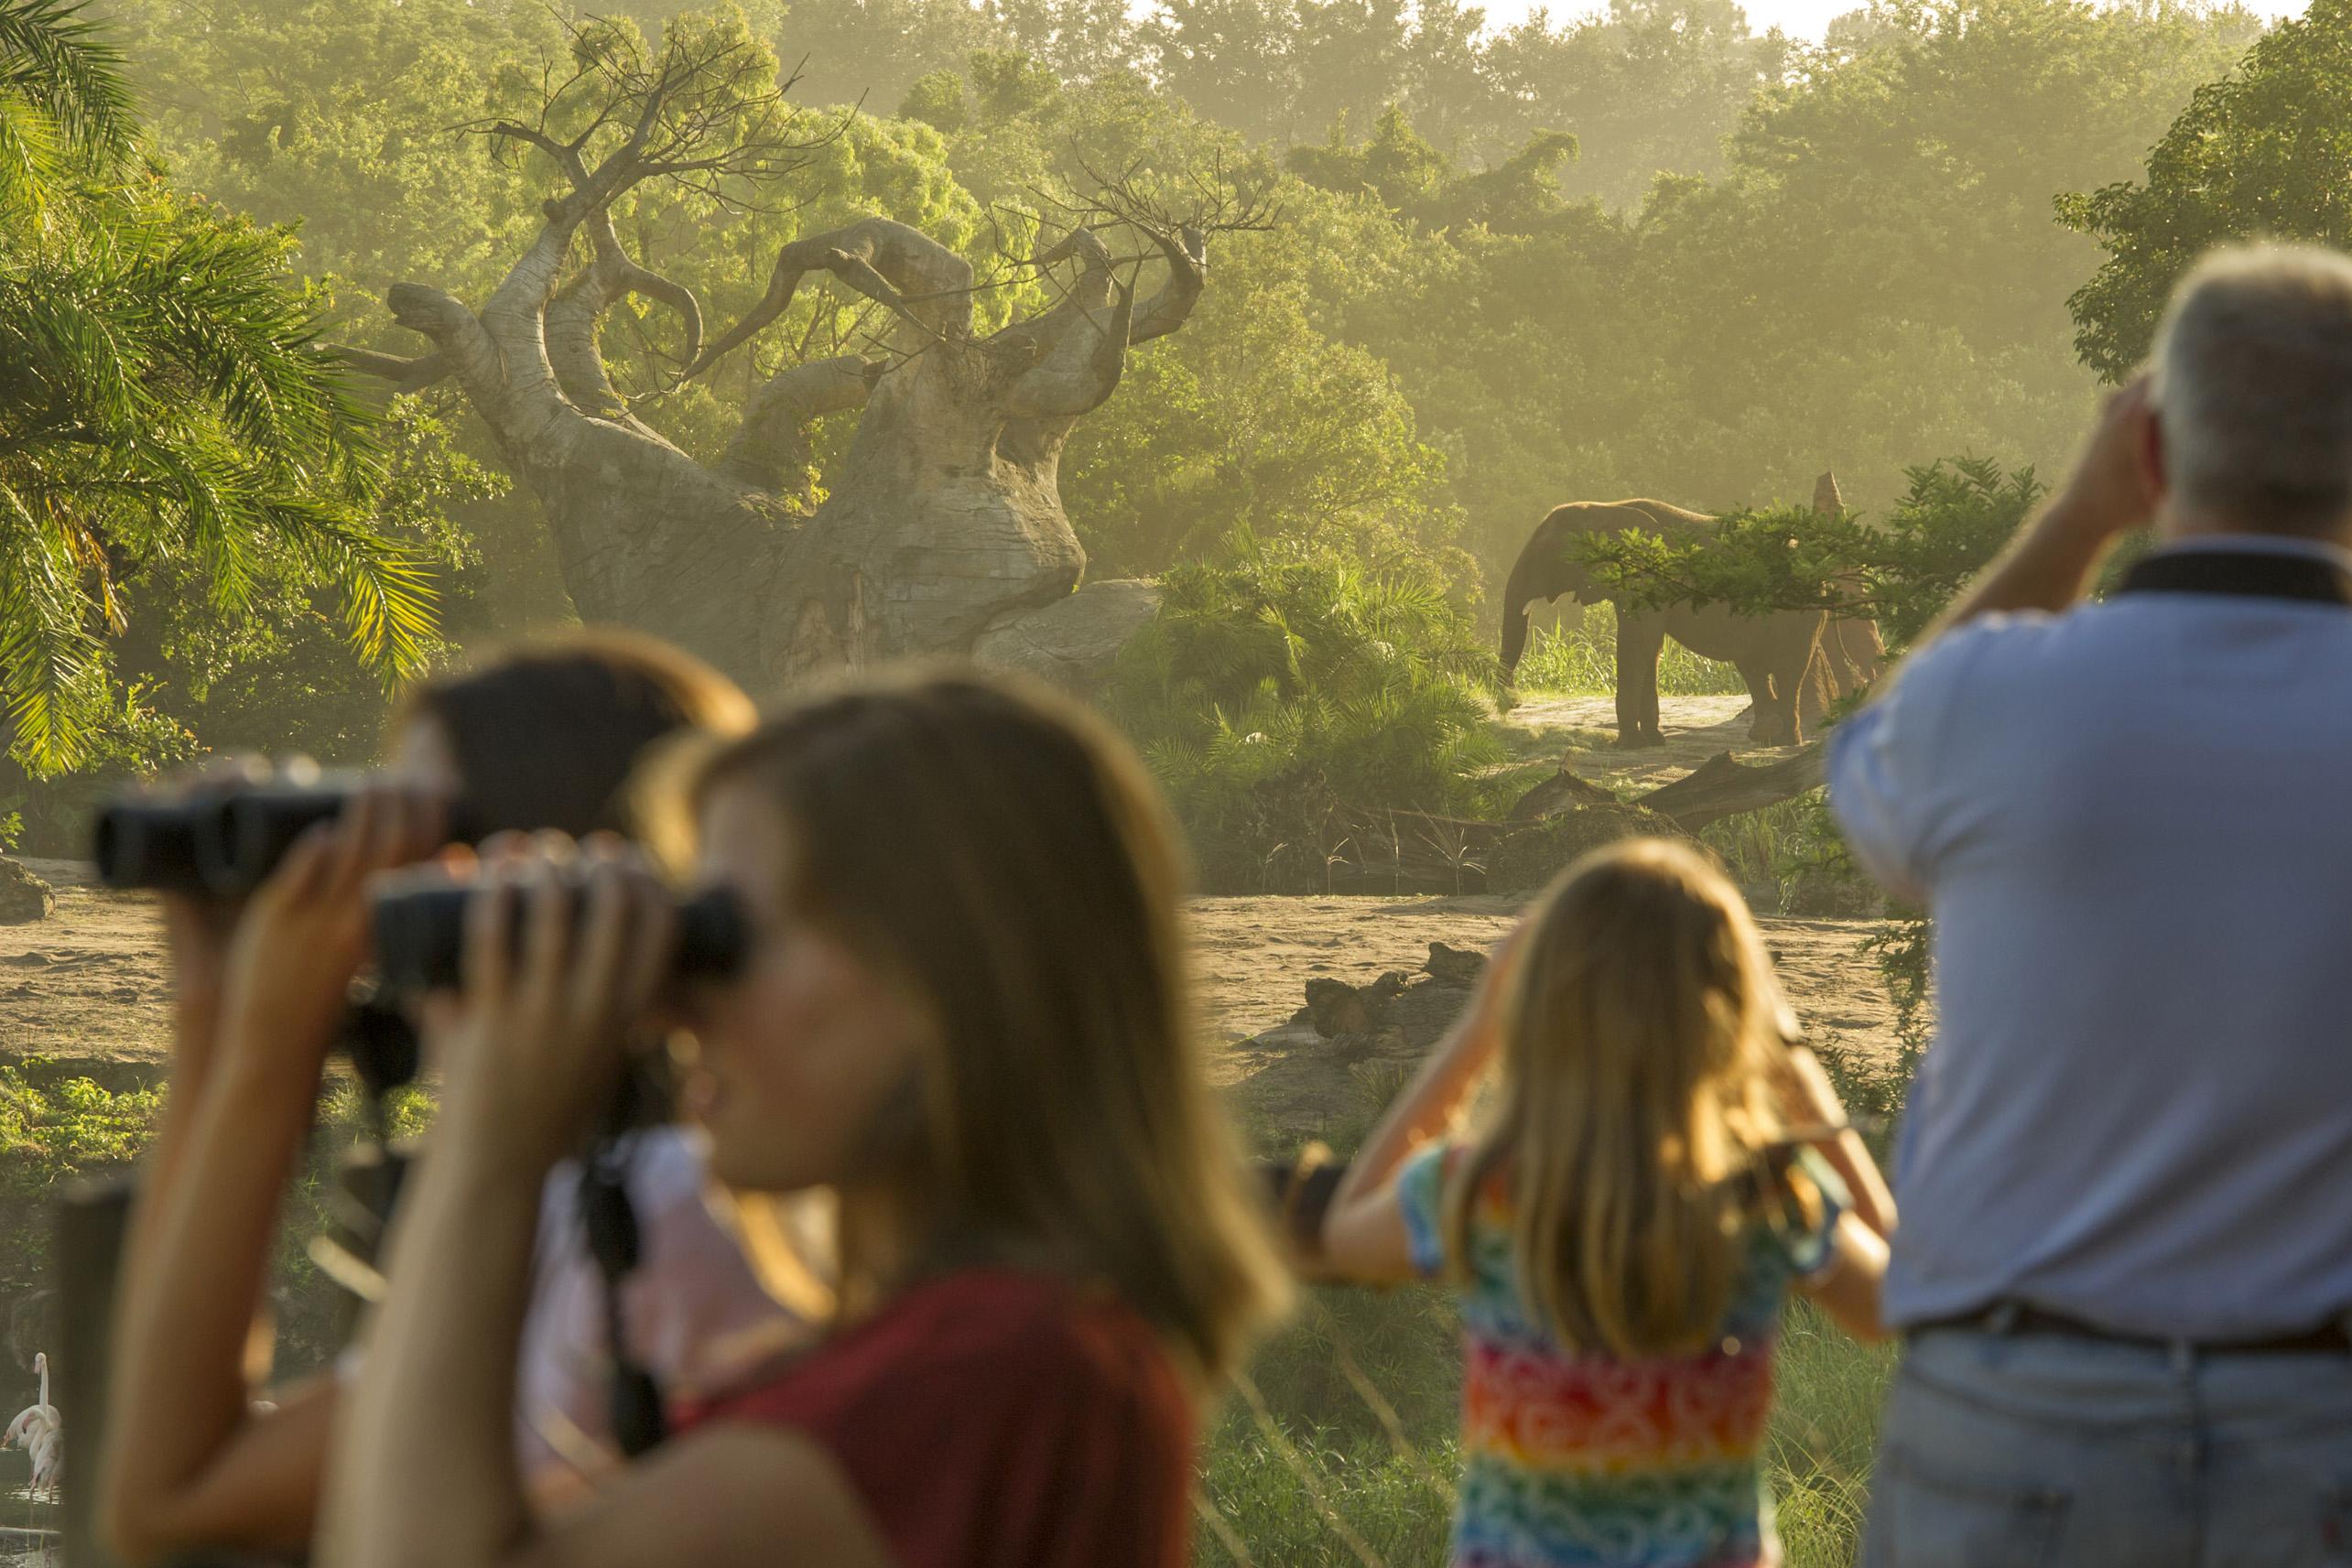 Walt Disney World Wild Africa Trek at Animal Kingdom